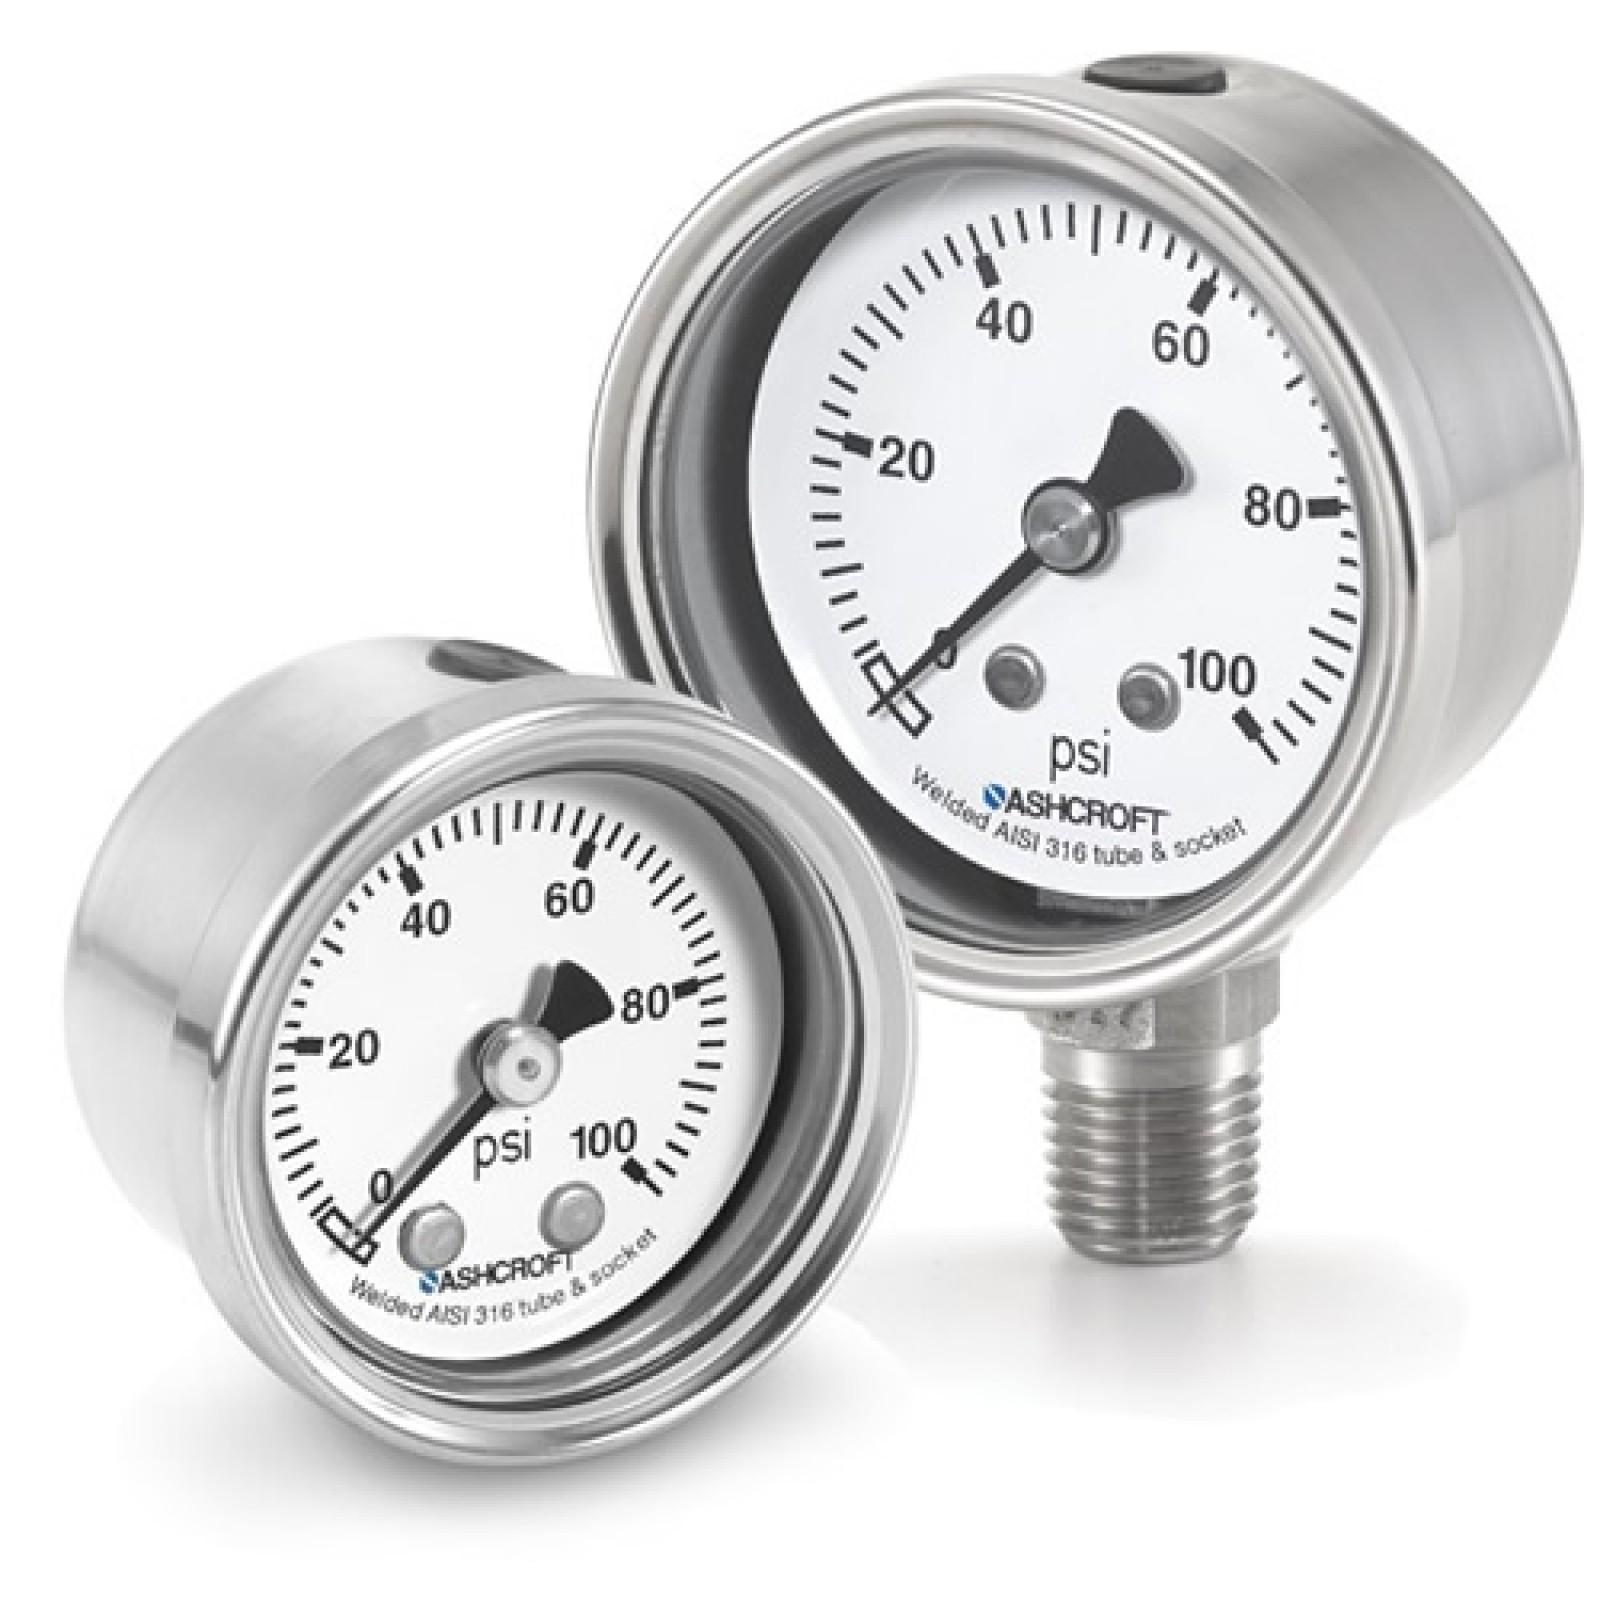 "63 1008S 02L XLL 300#/KP - Pressure Gauge, 63mm stainless 1/4"" NPT Lower conn & Case, Plus Performance 0/300 psi"